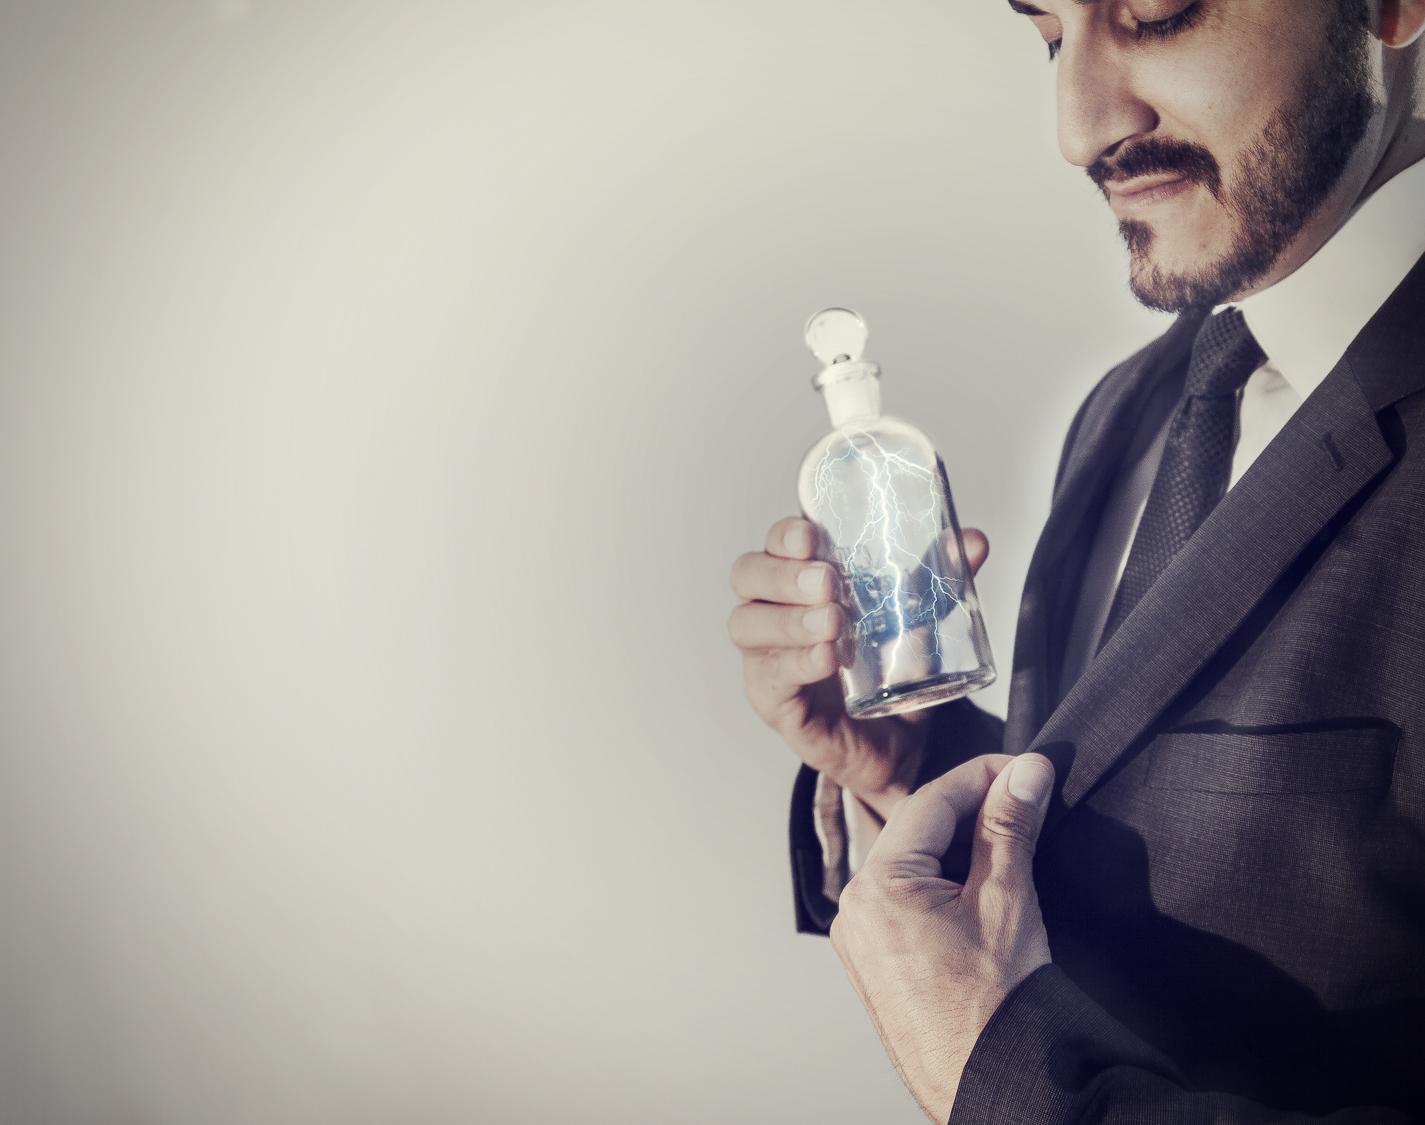 business man puts bottle of lightning in his pocket